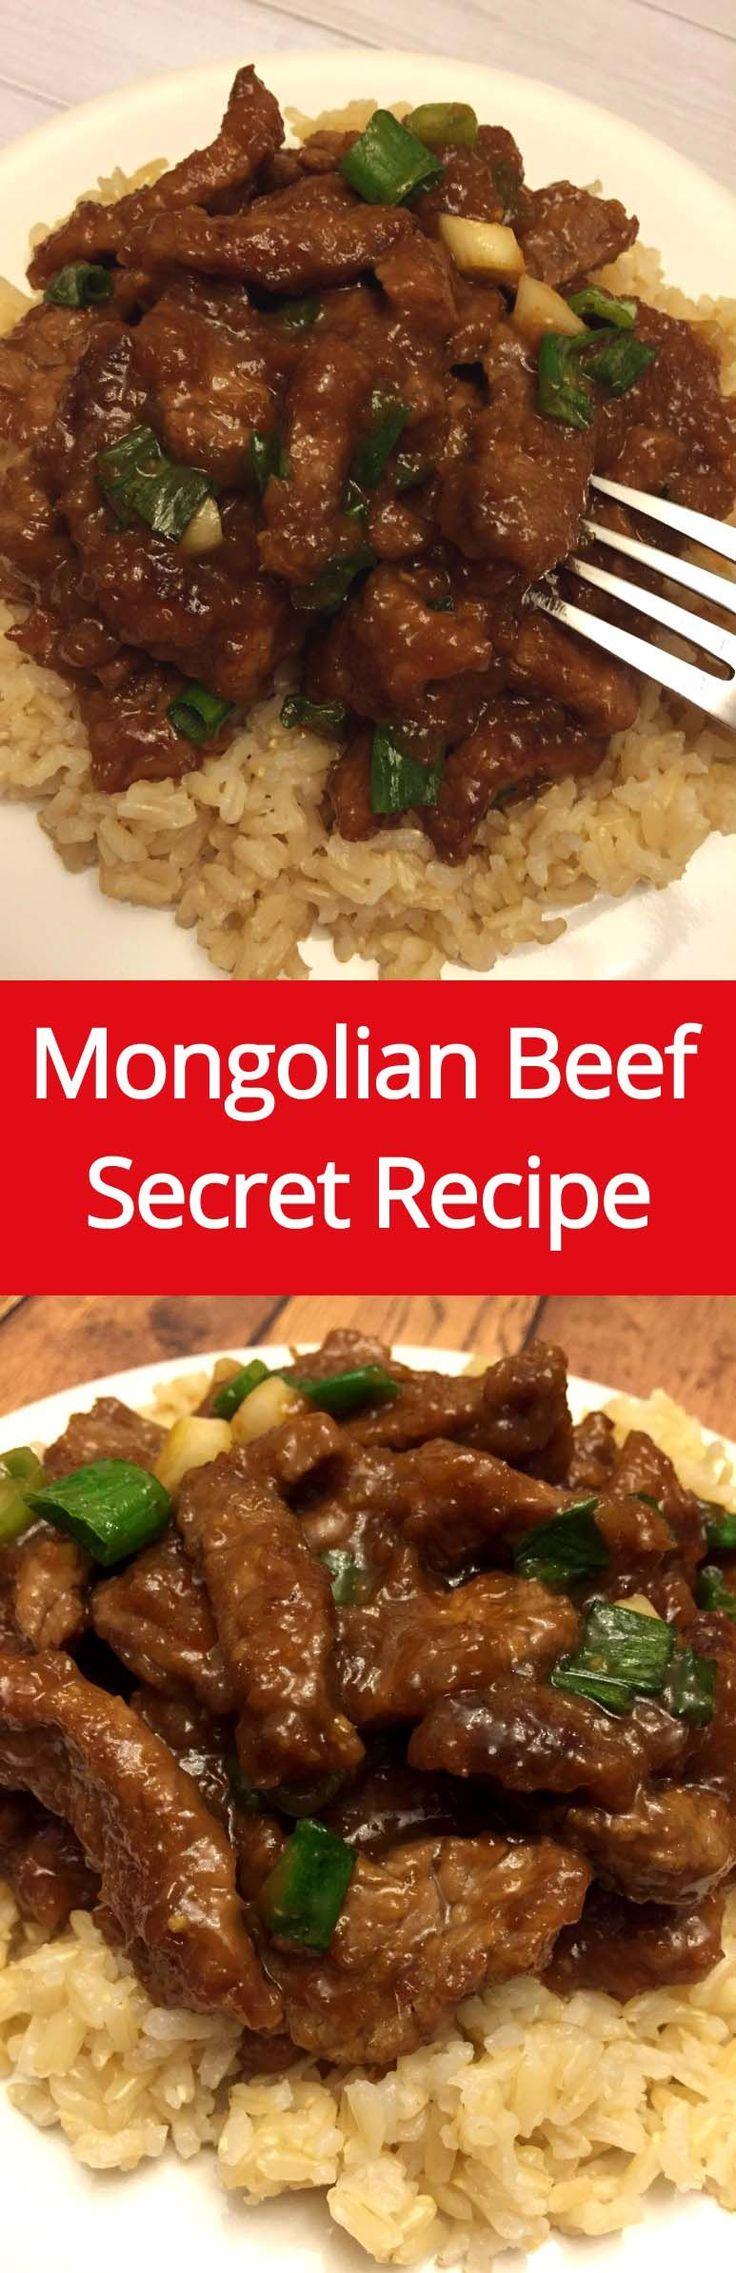 Mongolian Beef Recipe - Secret Copycat Recipe To Make Mongolian Beef Like P.F.Chang's! | MelanieCooks.com